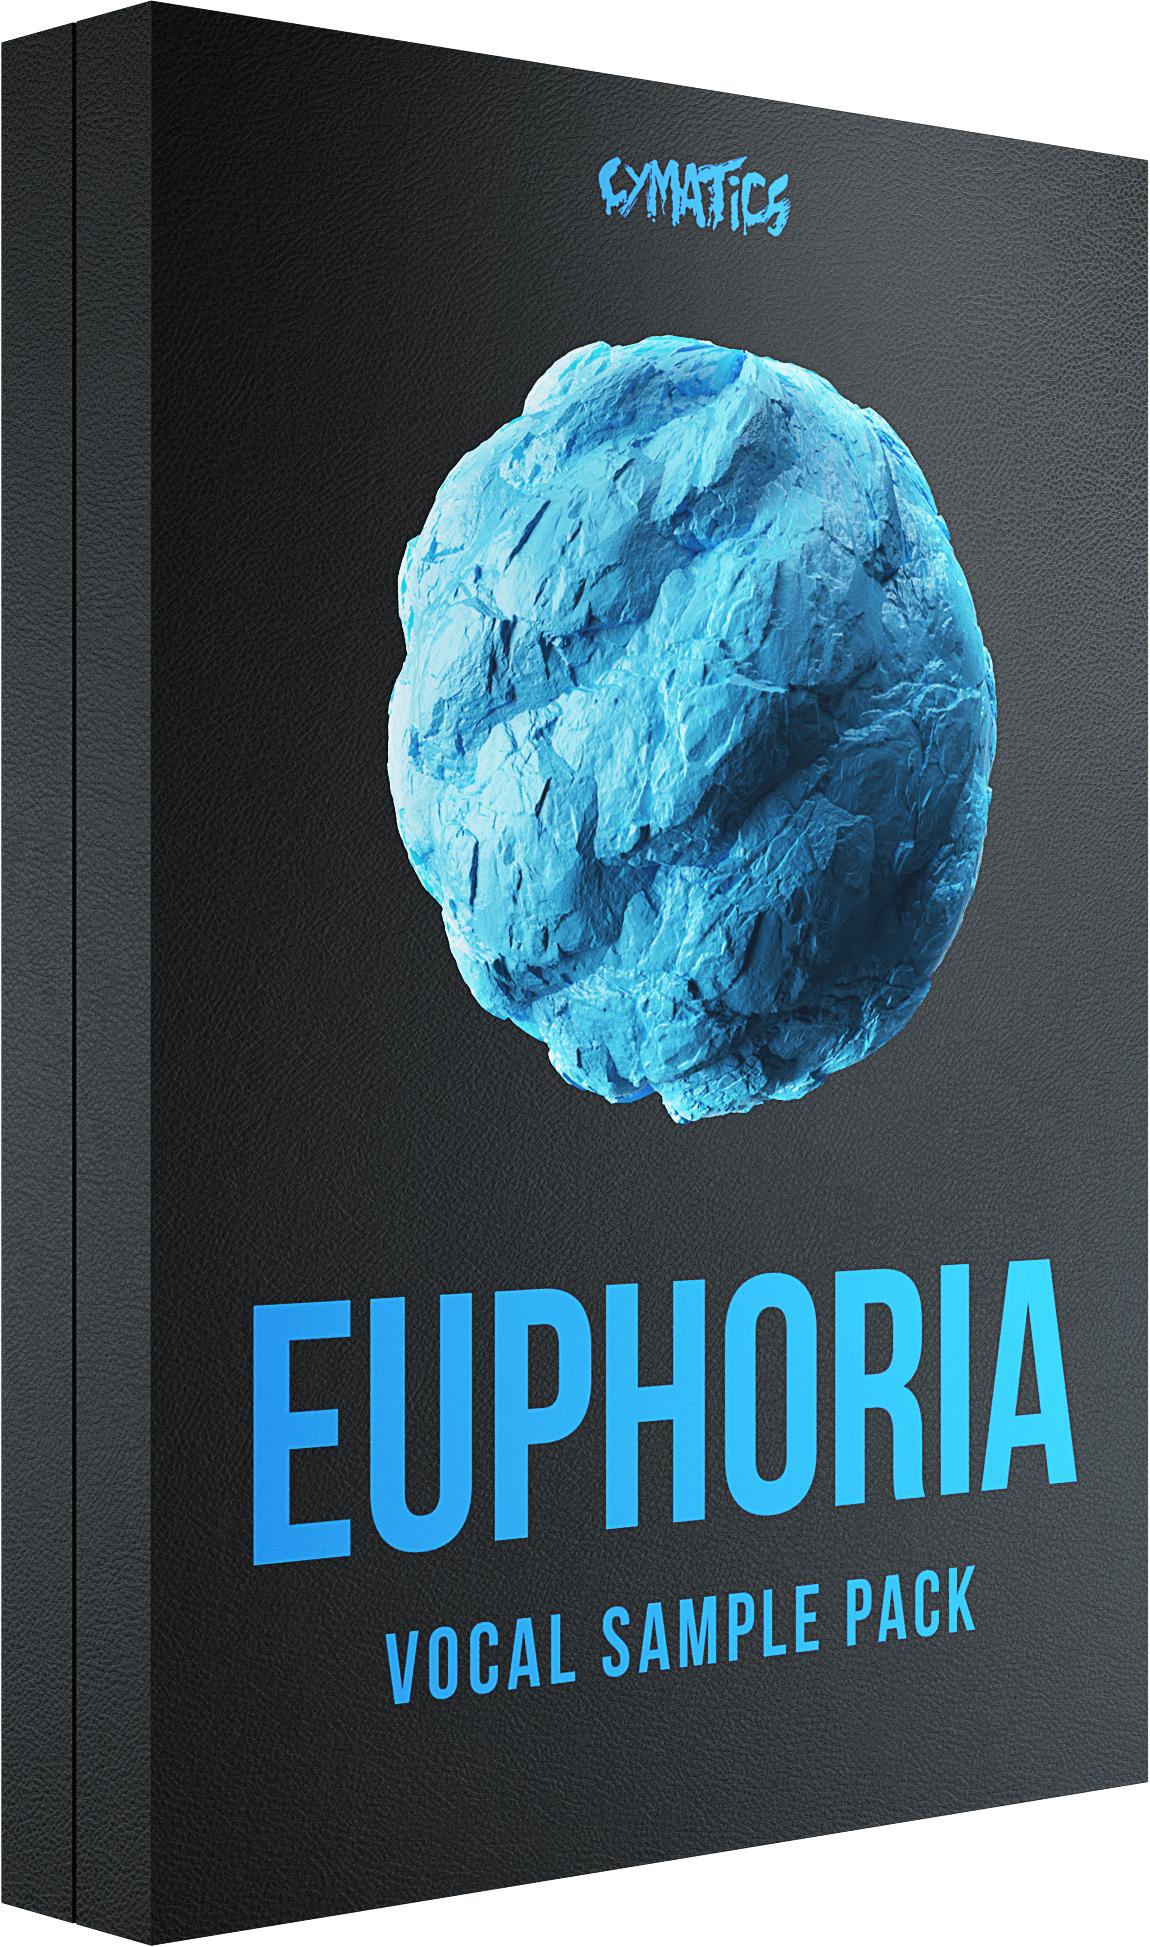 EUPHORIA VOCAL SAMPLE PACK